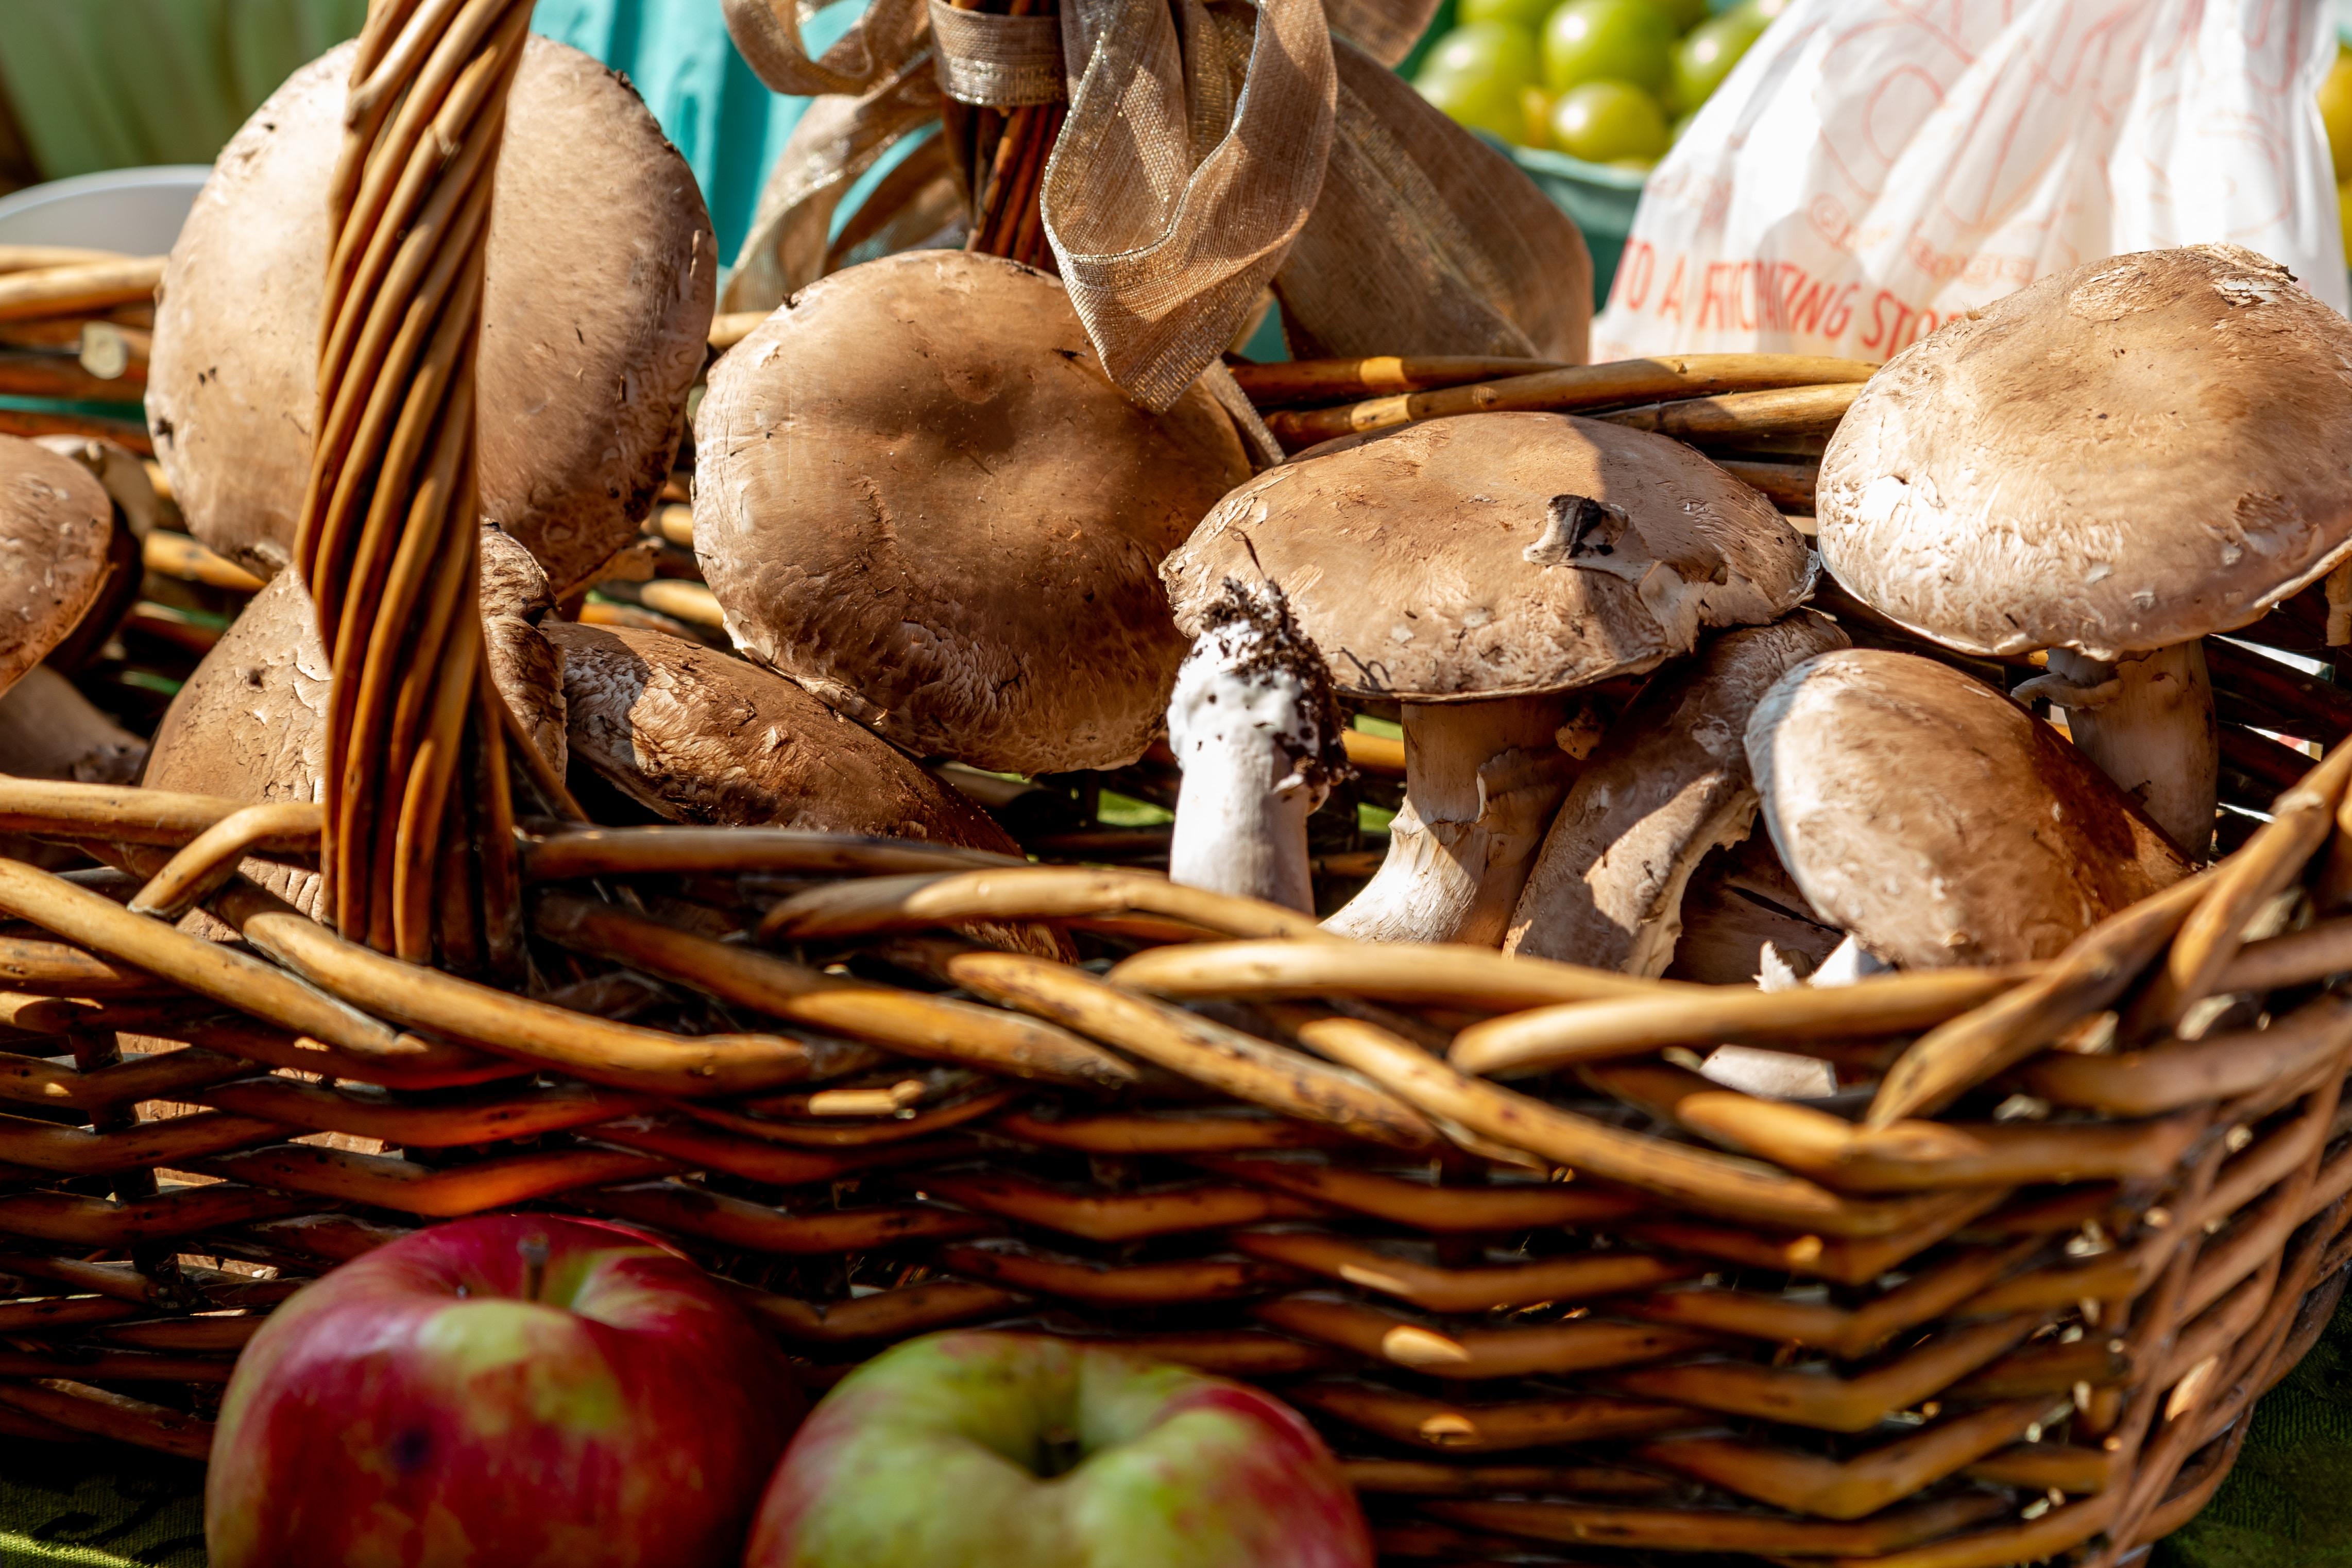 grow mushrooms at home